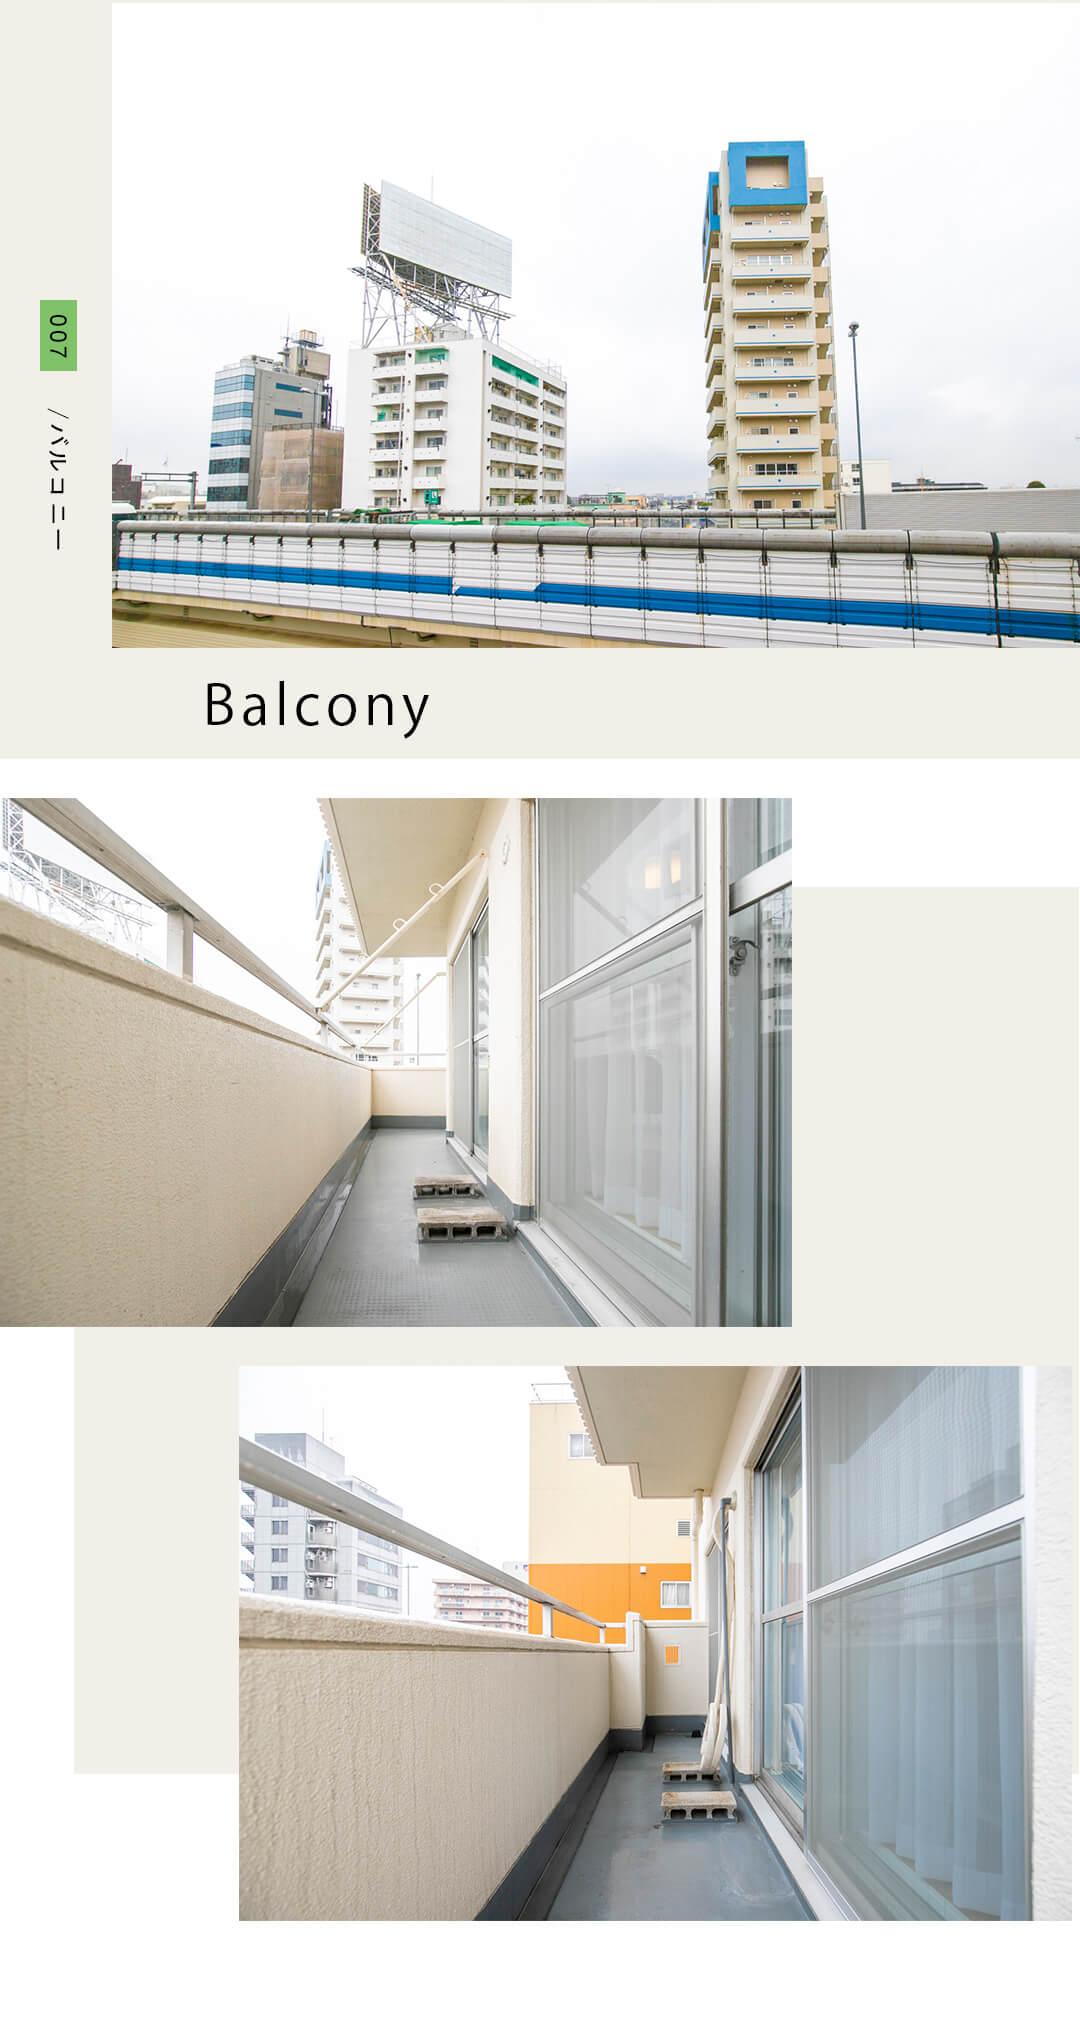 007,Balcony,バルコニー